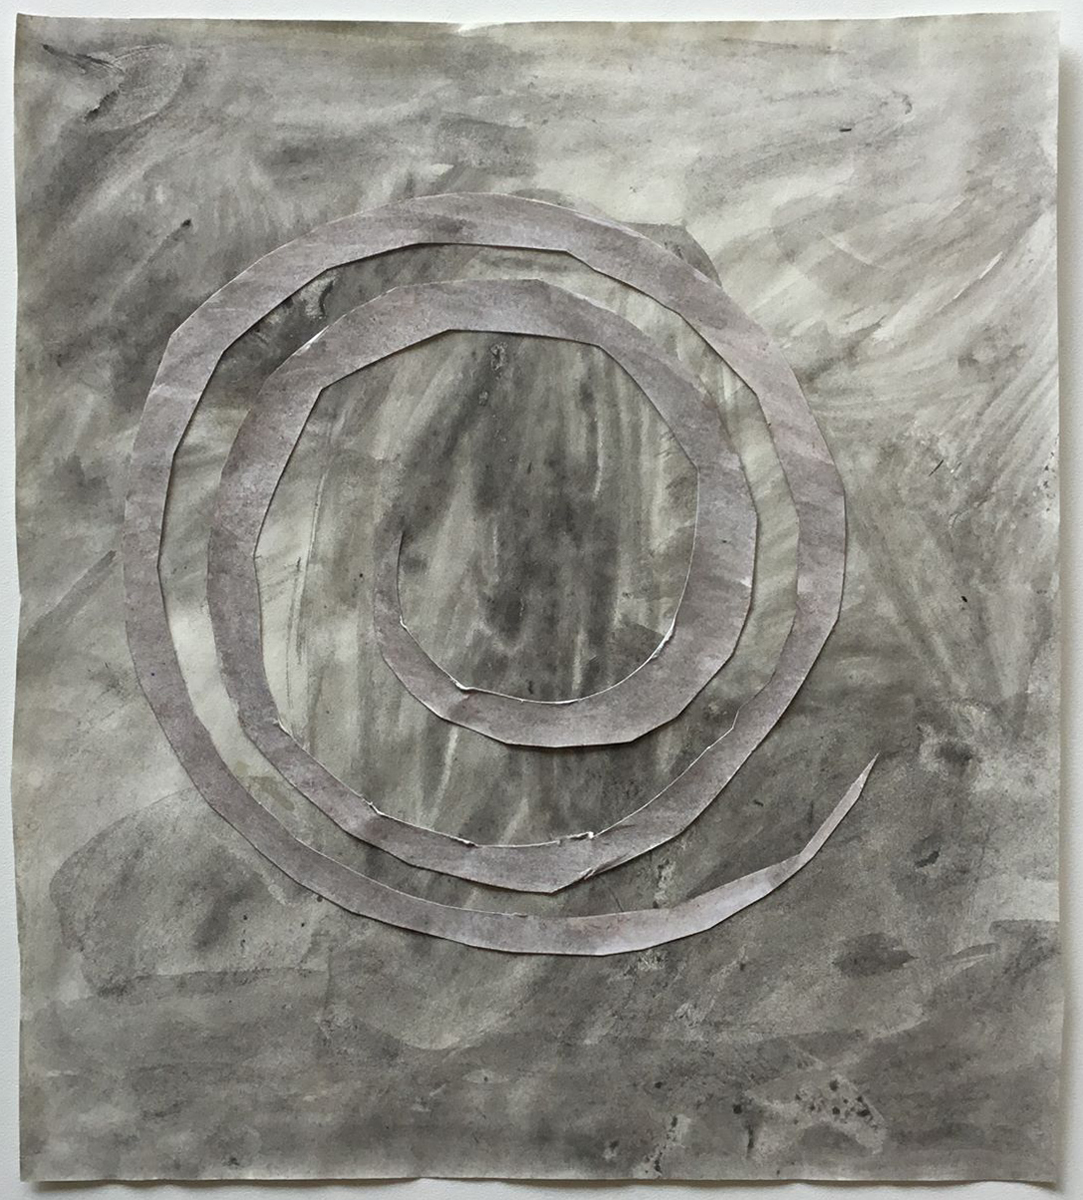 Carl Johan Sennels   Flux #1, 2011. Watercolor on paper, 21x19 cm